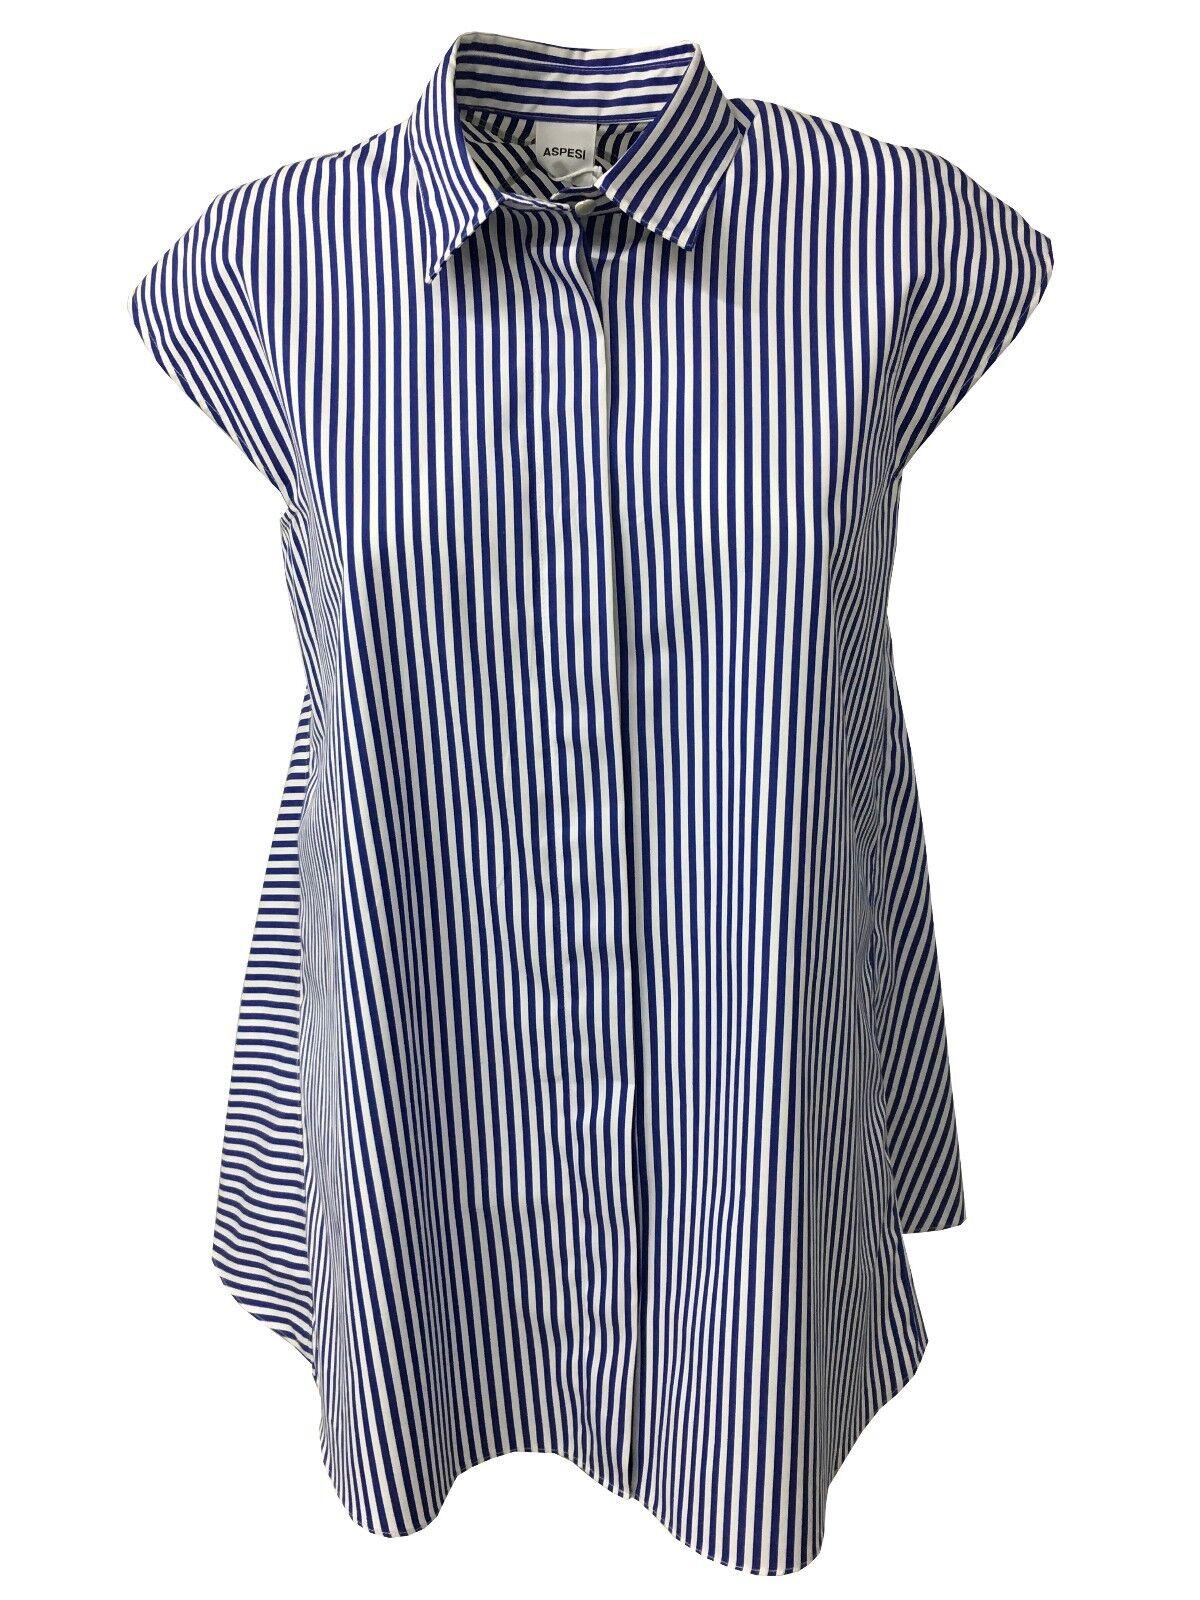 ASPESI Damenhemd Streifen weiß blau Modell H809 B863 100% Baumwolle